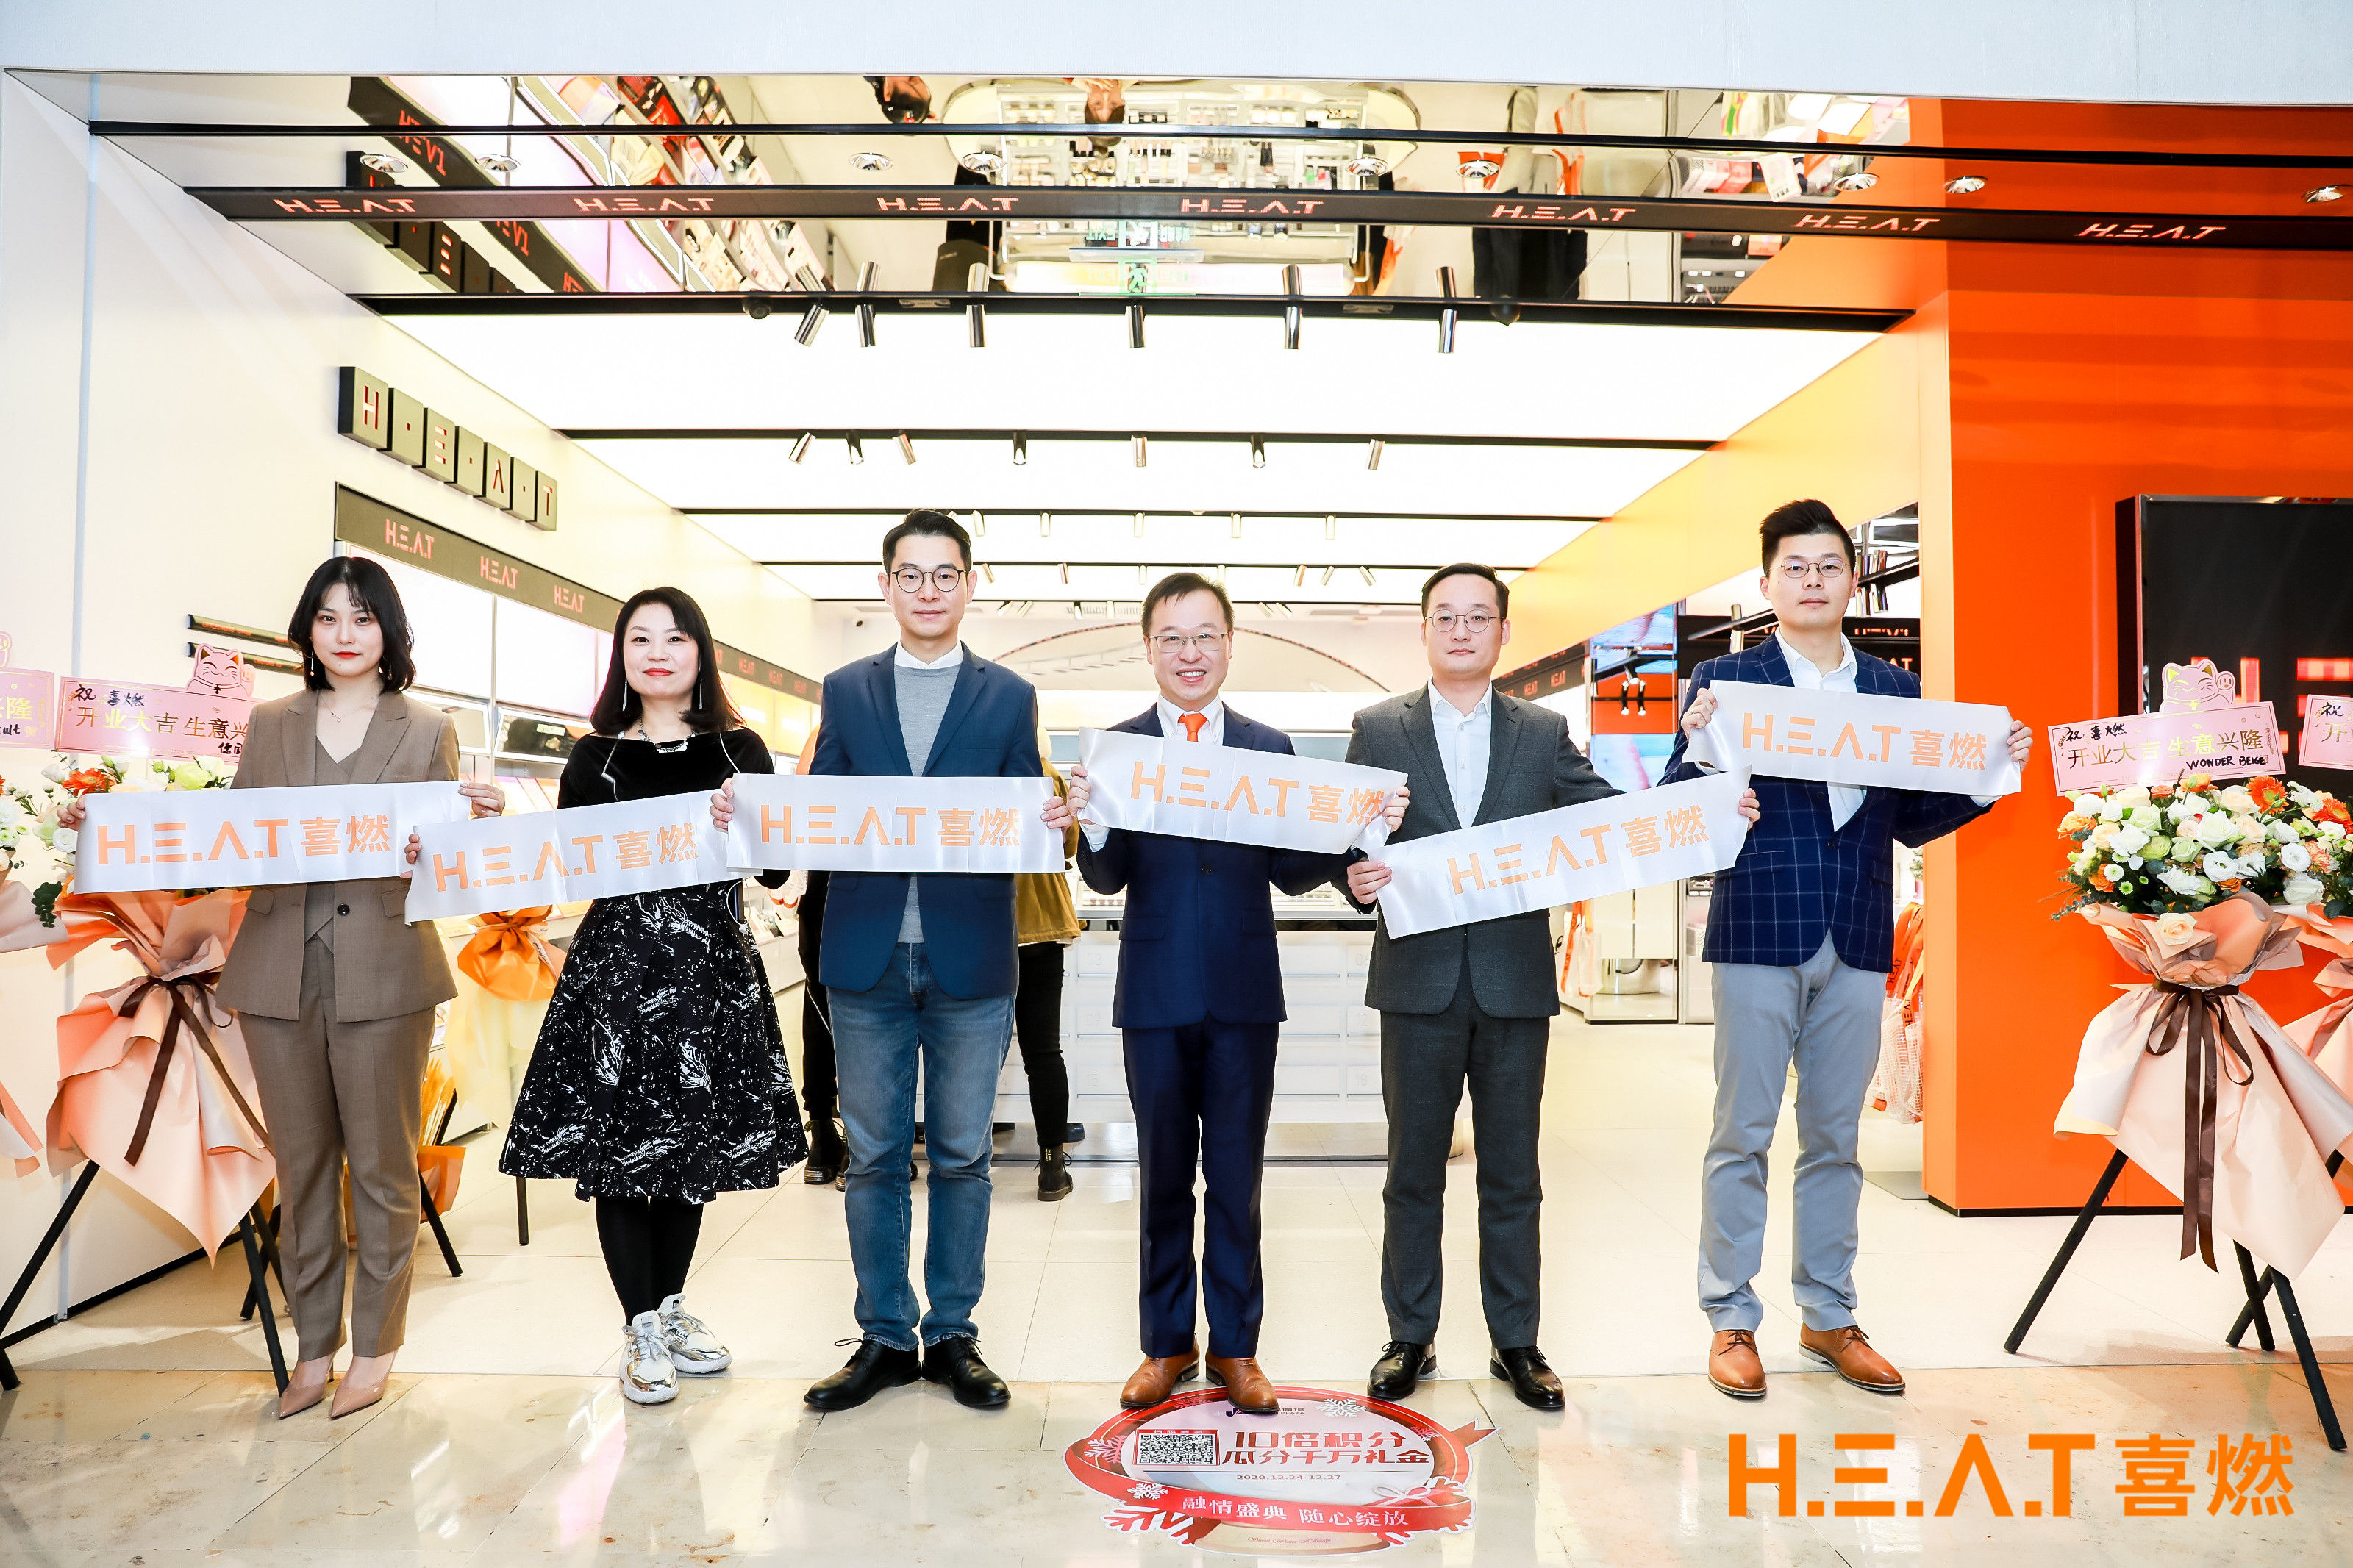 H.E.A.T喜燃南京德基廣場旗艦店開業儀式.jpg